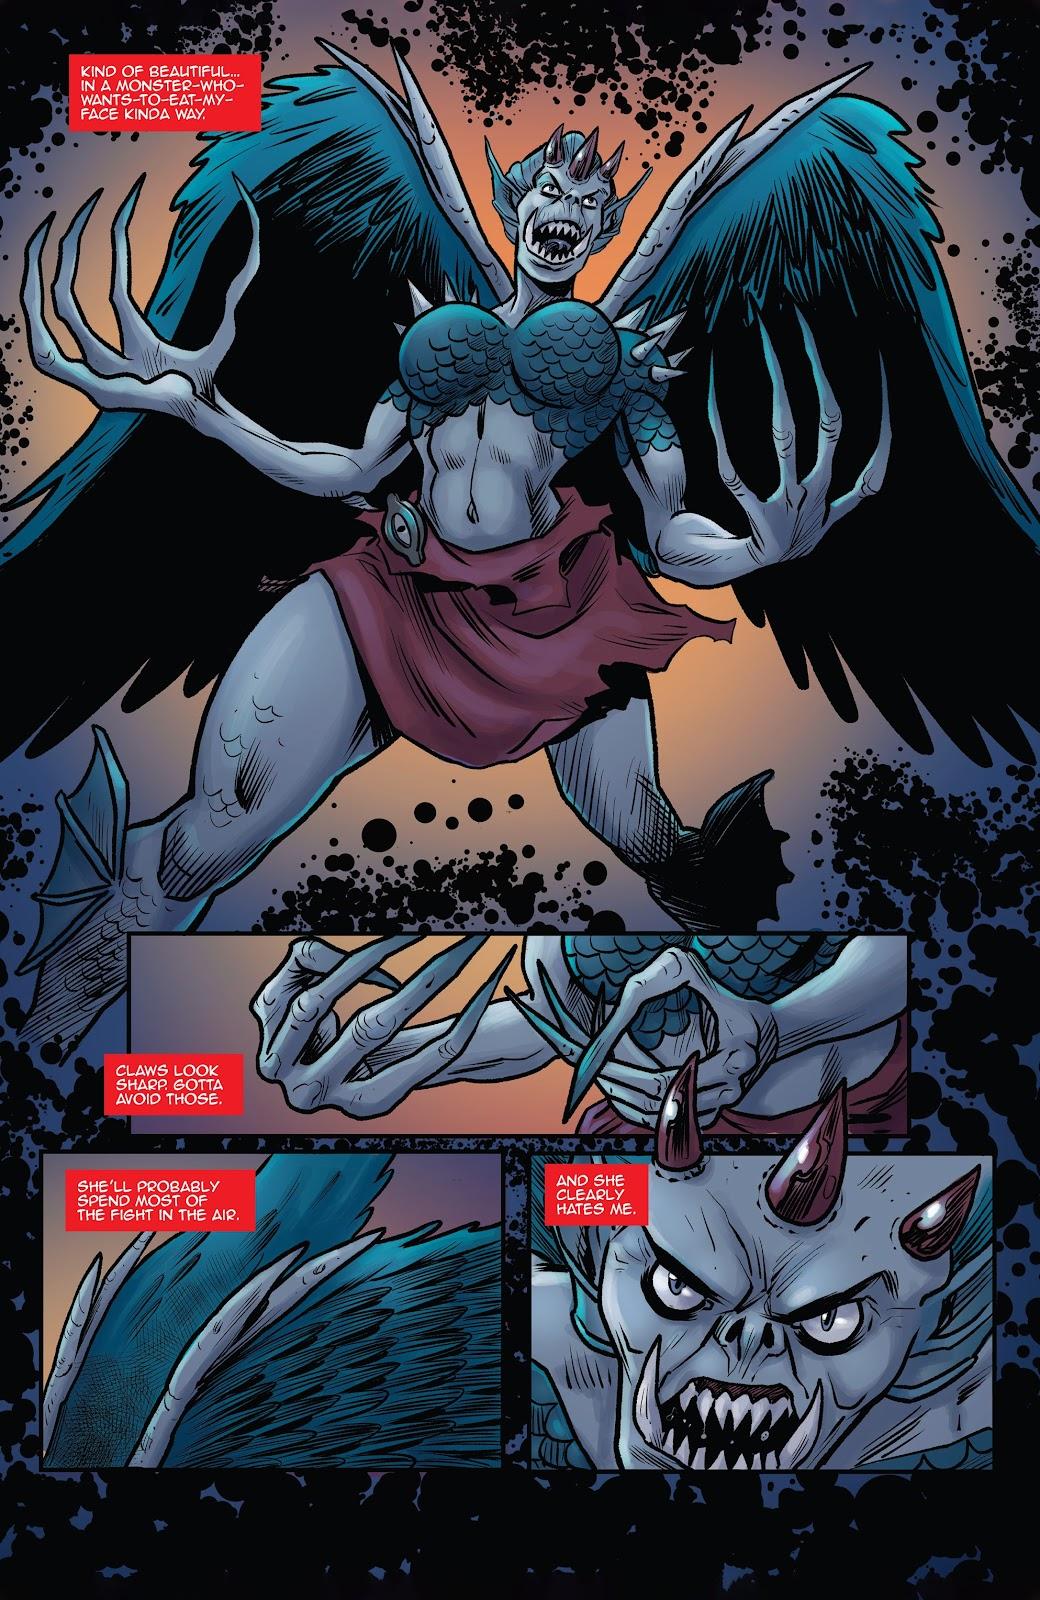 Read online Black Betty comic -  Issue #8 - 18